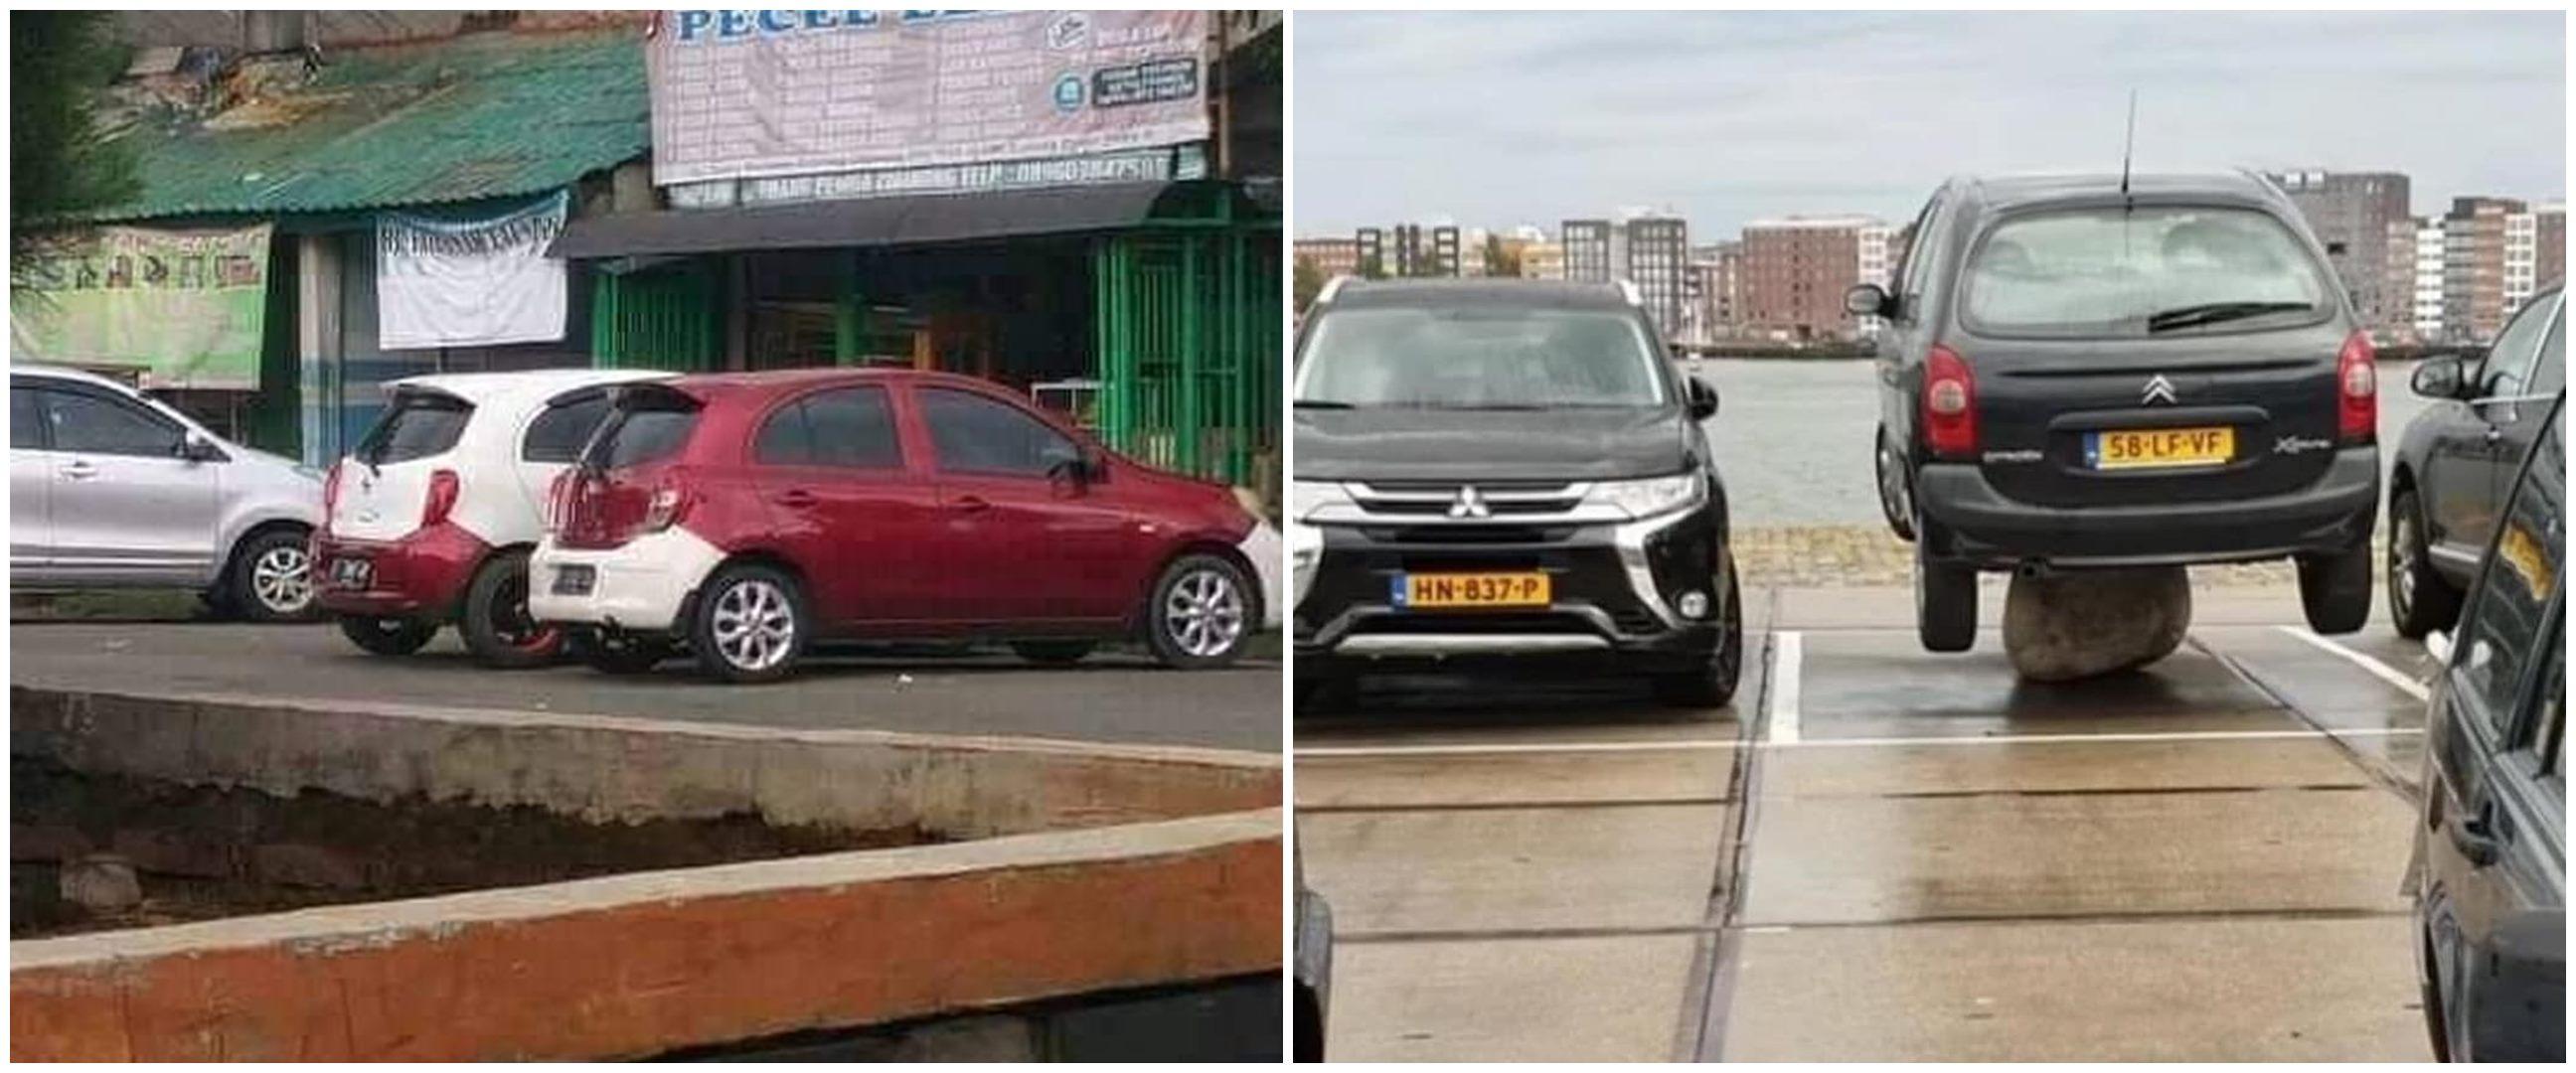 10 Penampakan kendaraan absurd di tempat parkir, bikin mikir keras